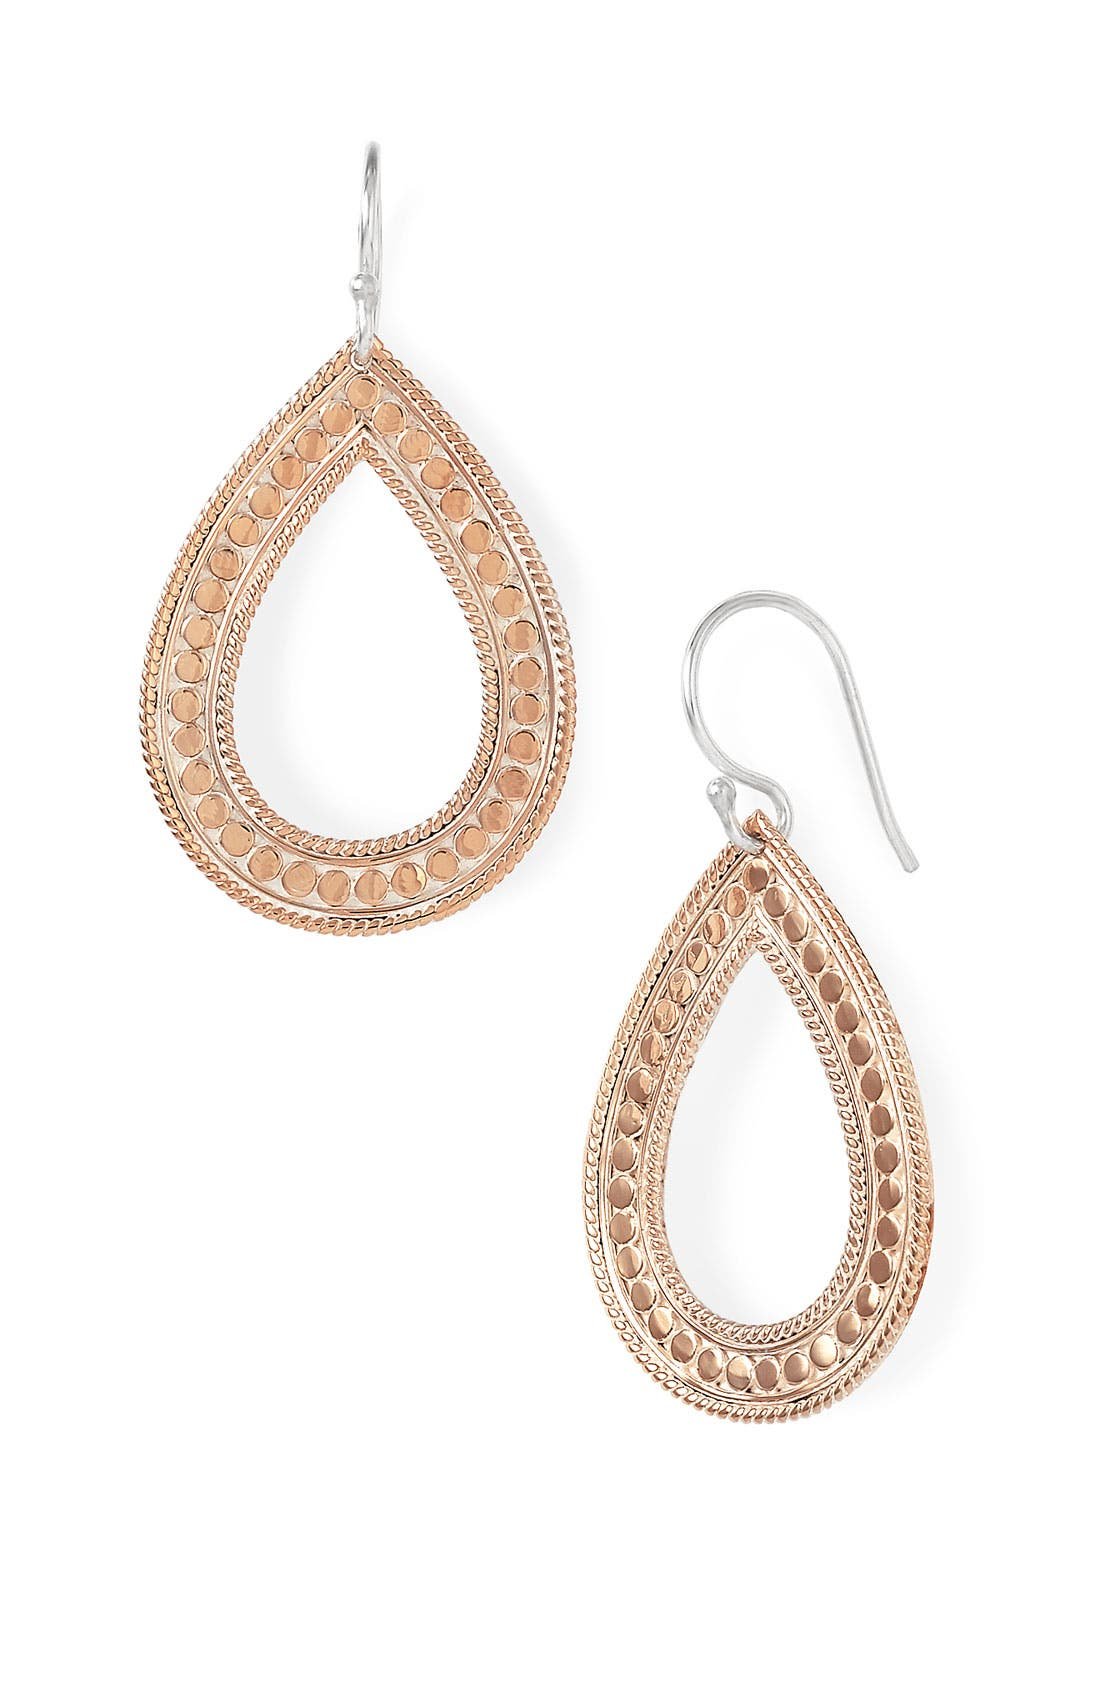 Alternate Image 1 Selected - Anna Beck 'Timor' Open Teardrop Earrings (Nordstrom Exclusive)